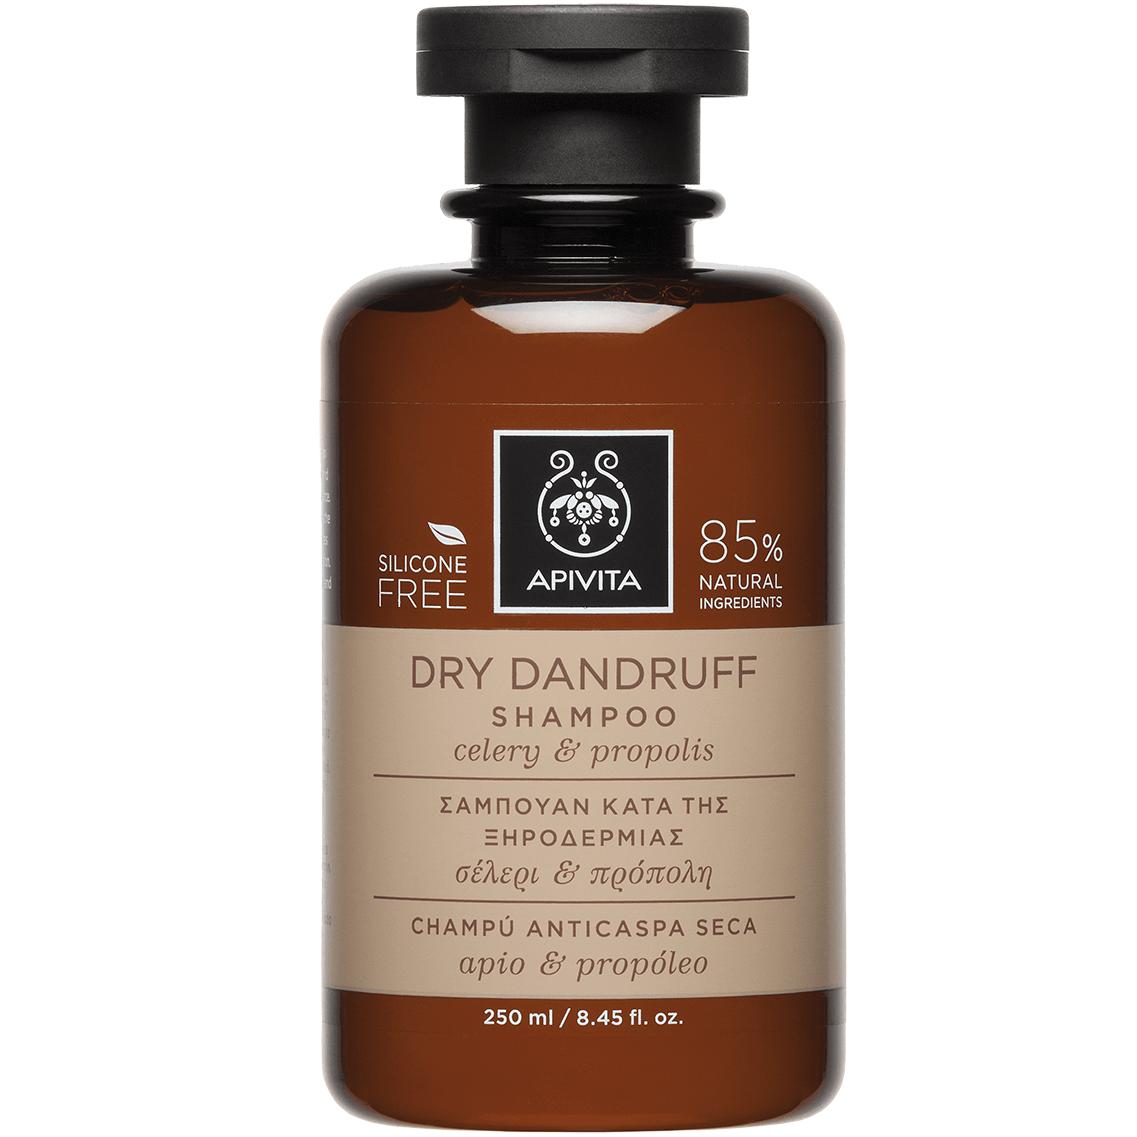 Apivita Dry Dandruff Σαμπουάν Κατά της Ξηροδερμίας με Σέλερι & Πρόπολη 250ml